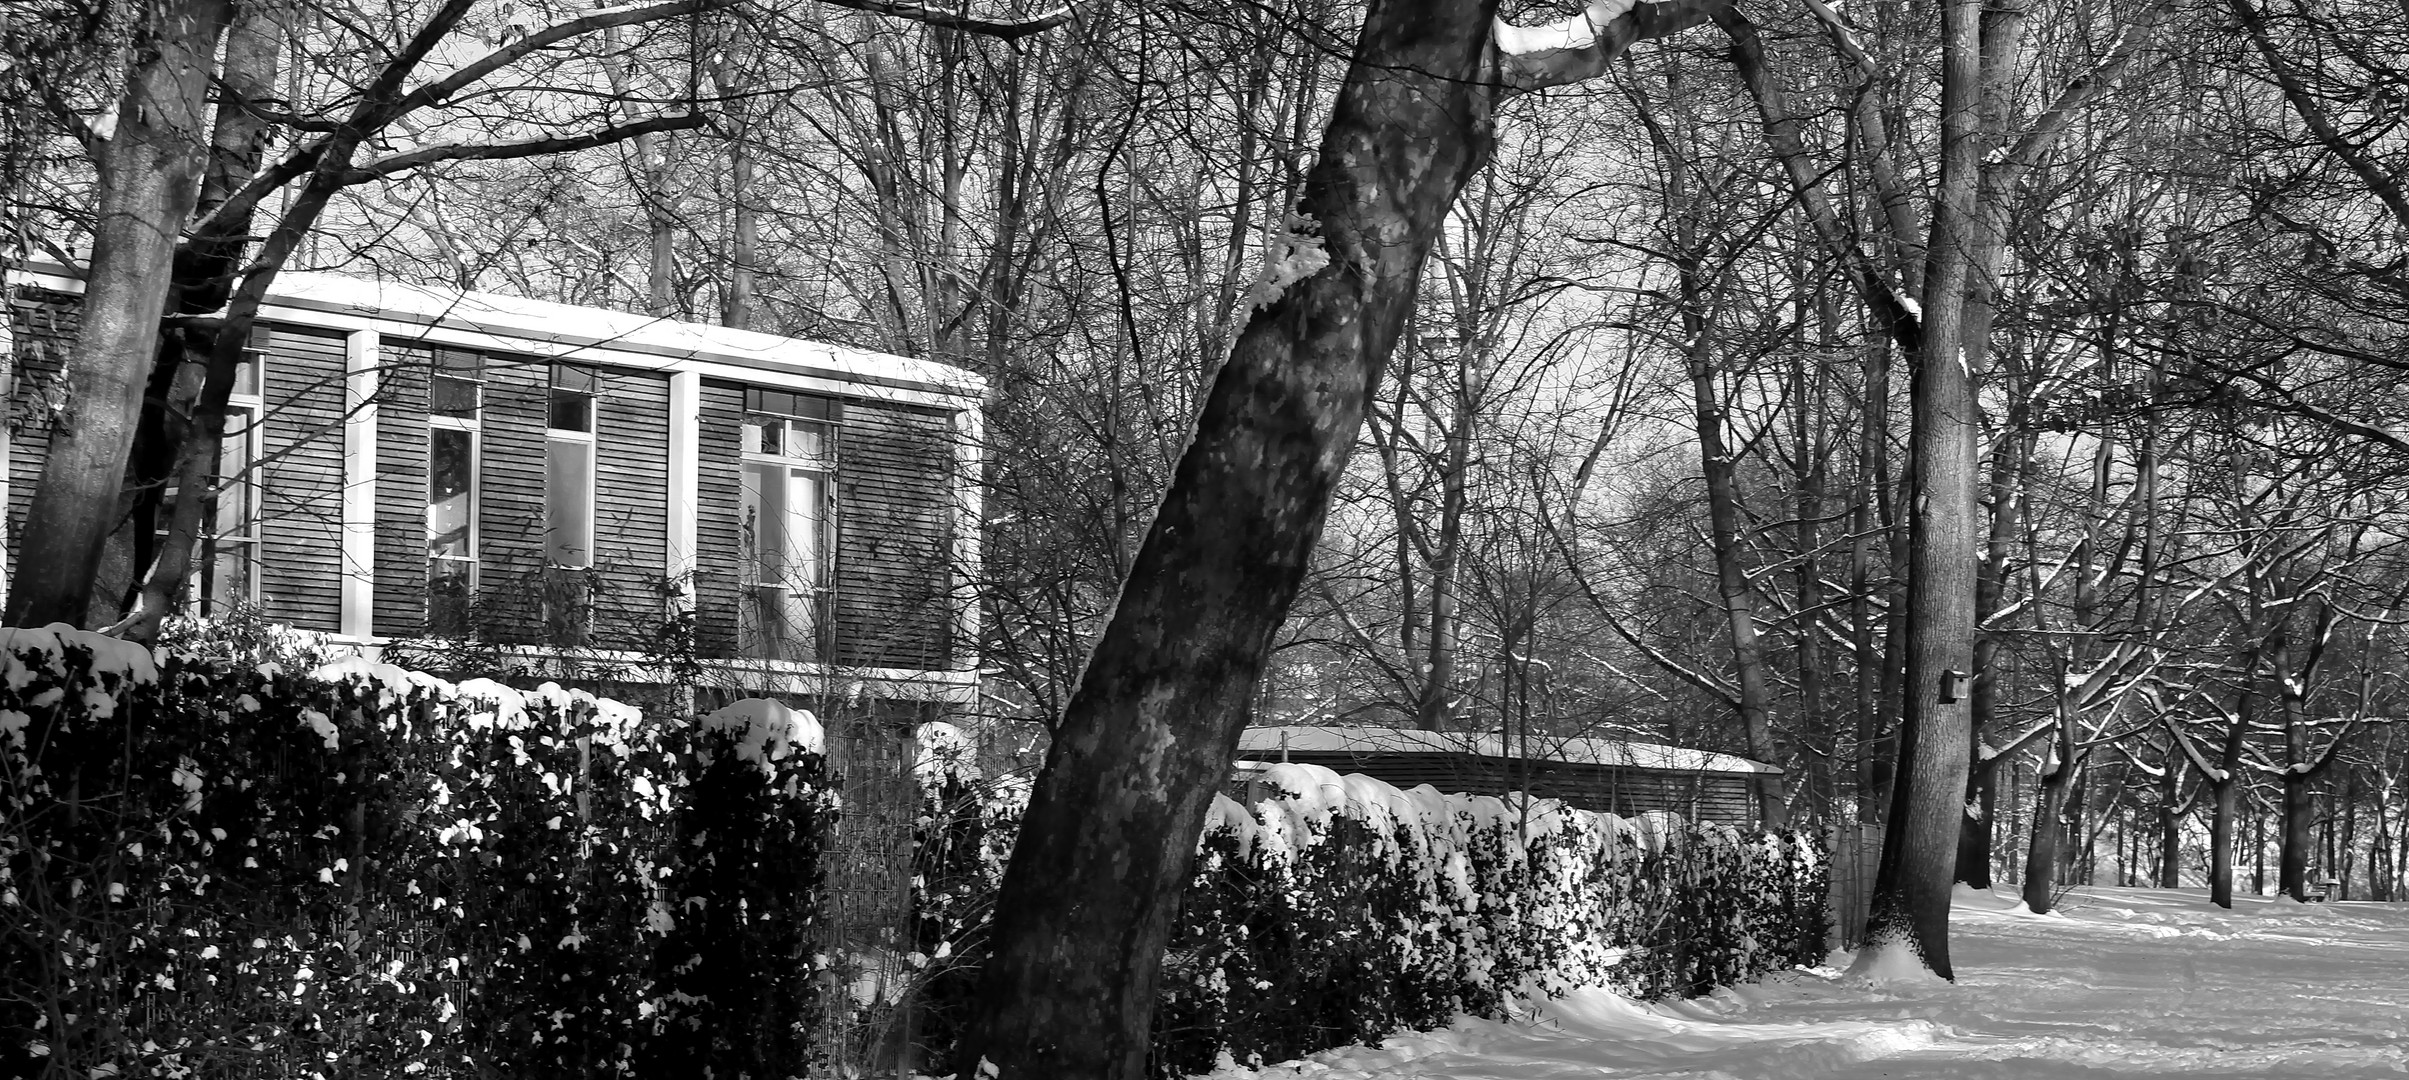 Kubushäuser in Nürnberger Park